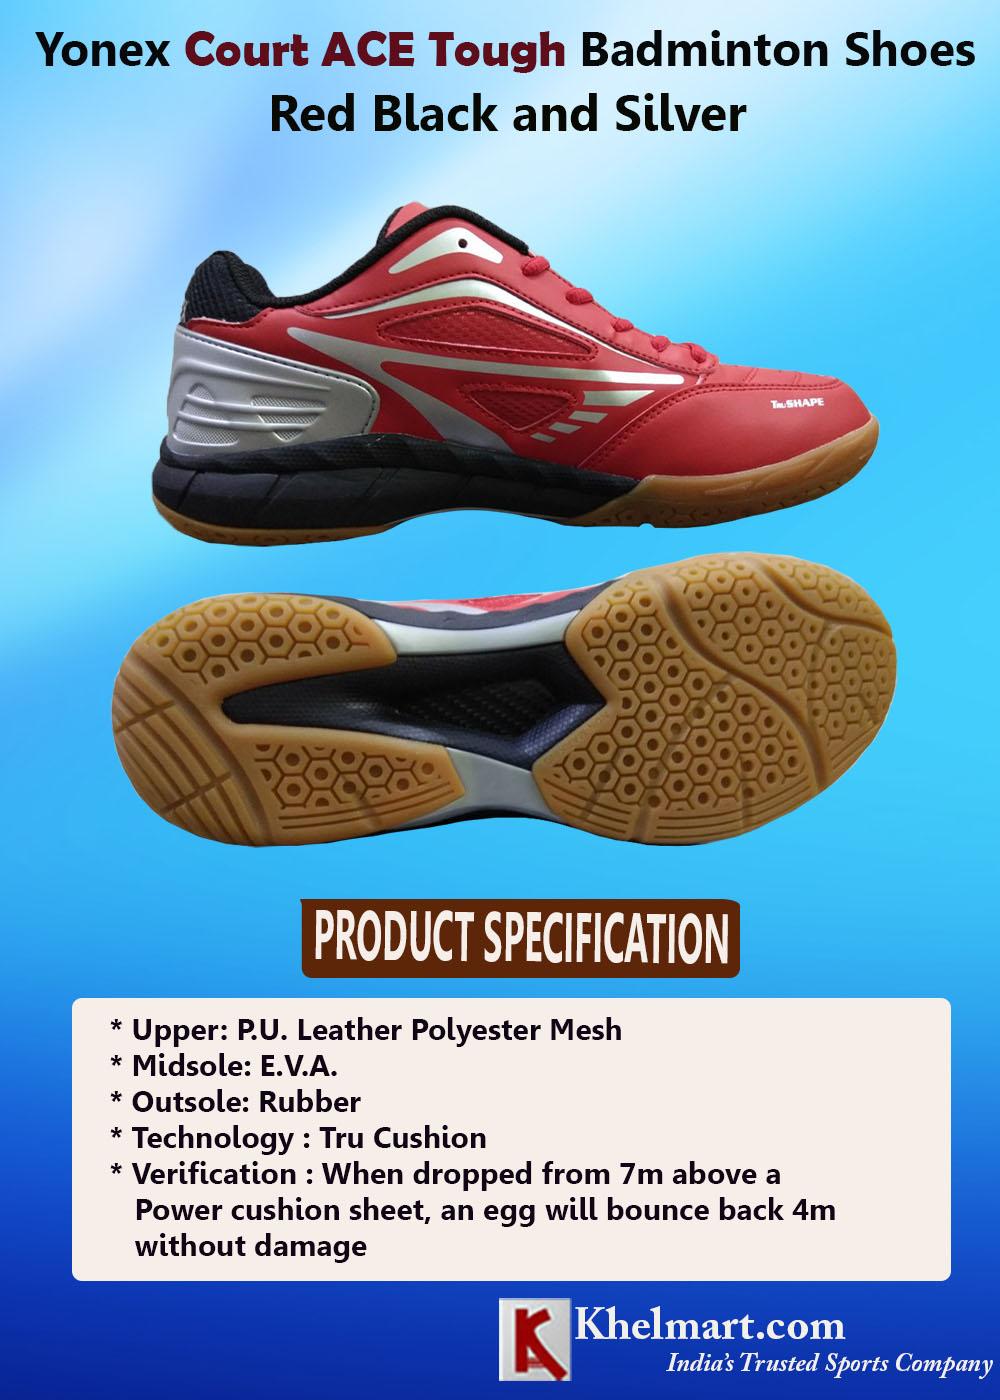 Yonex Court ACE Tough Badminton Shoes Red Black and Silver_6